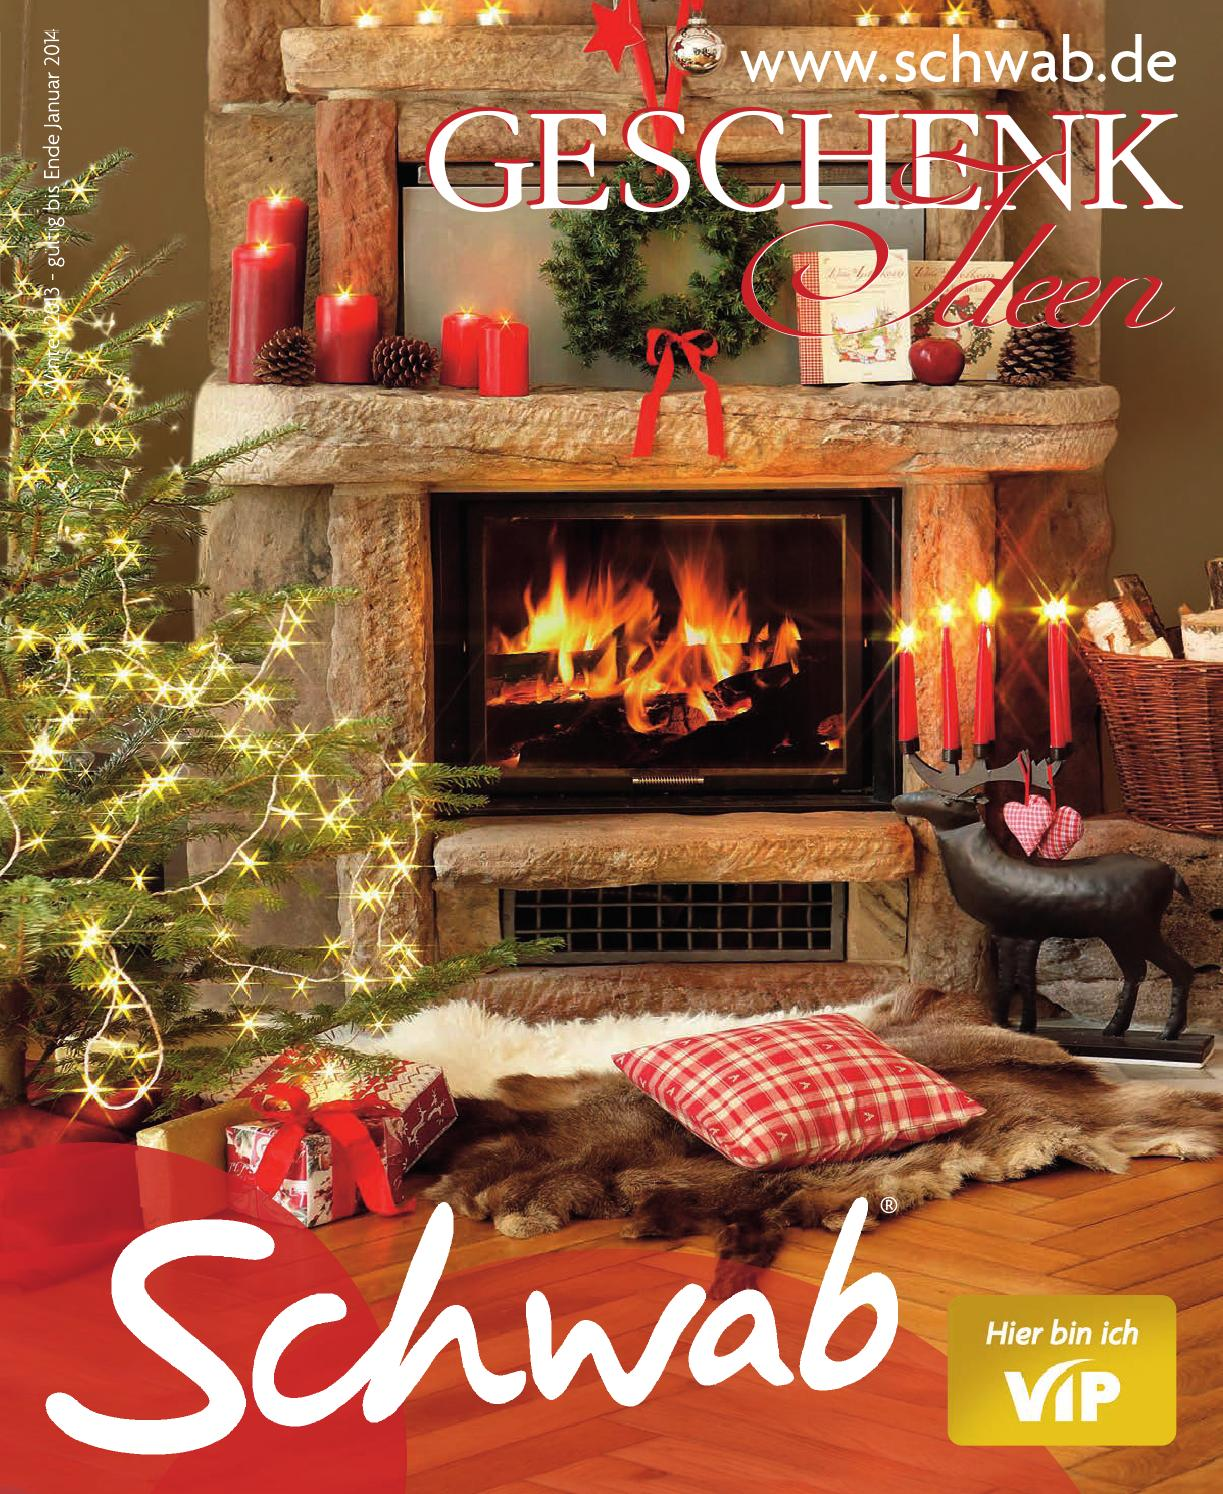 Каталог Geschenk ideen зима 20132014. Заказ товаров на www